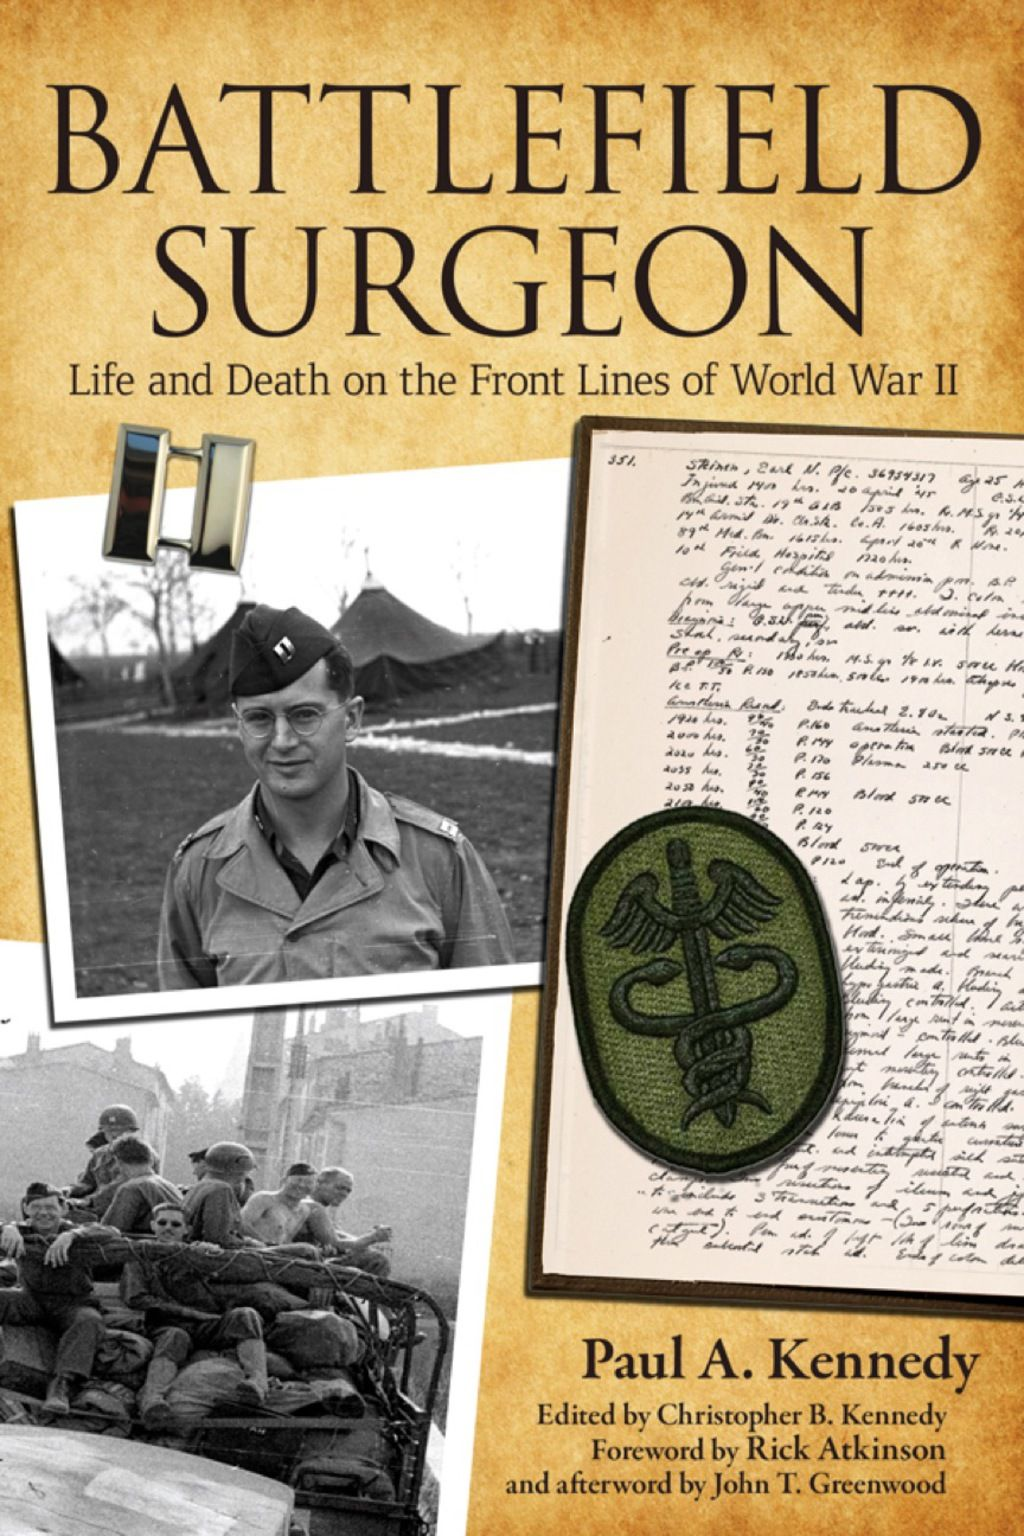 Battlefield surgeon ebook life death books ebooks